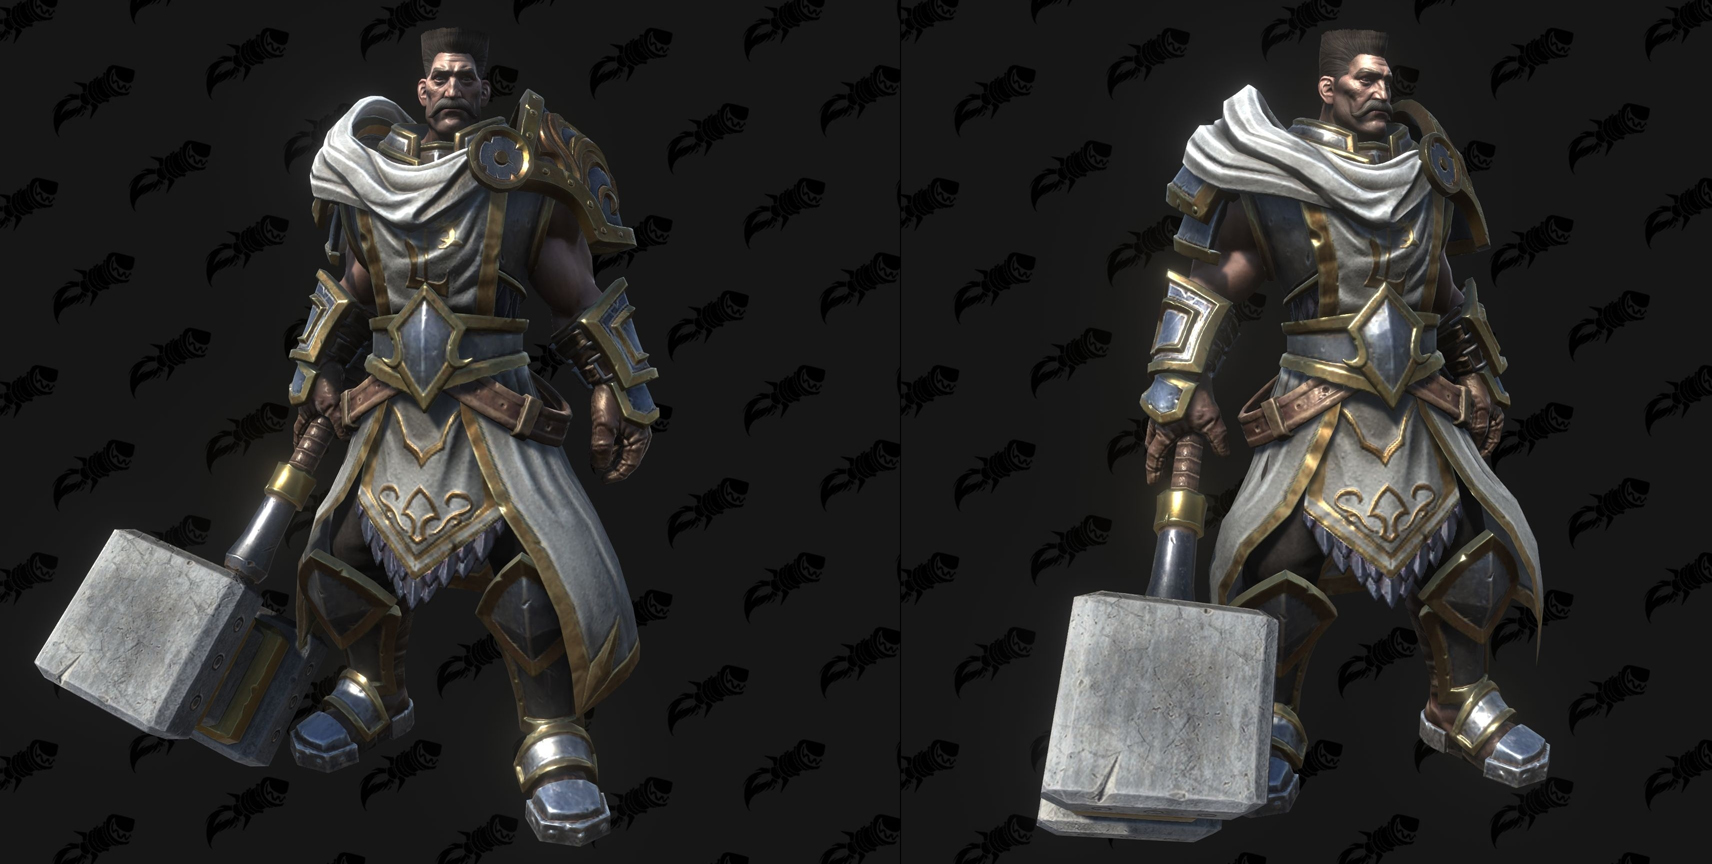 Modèle Warcraft III Reforged : Paladin Hero